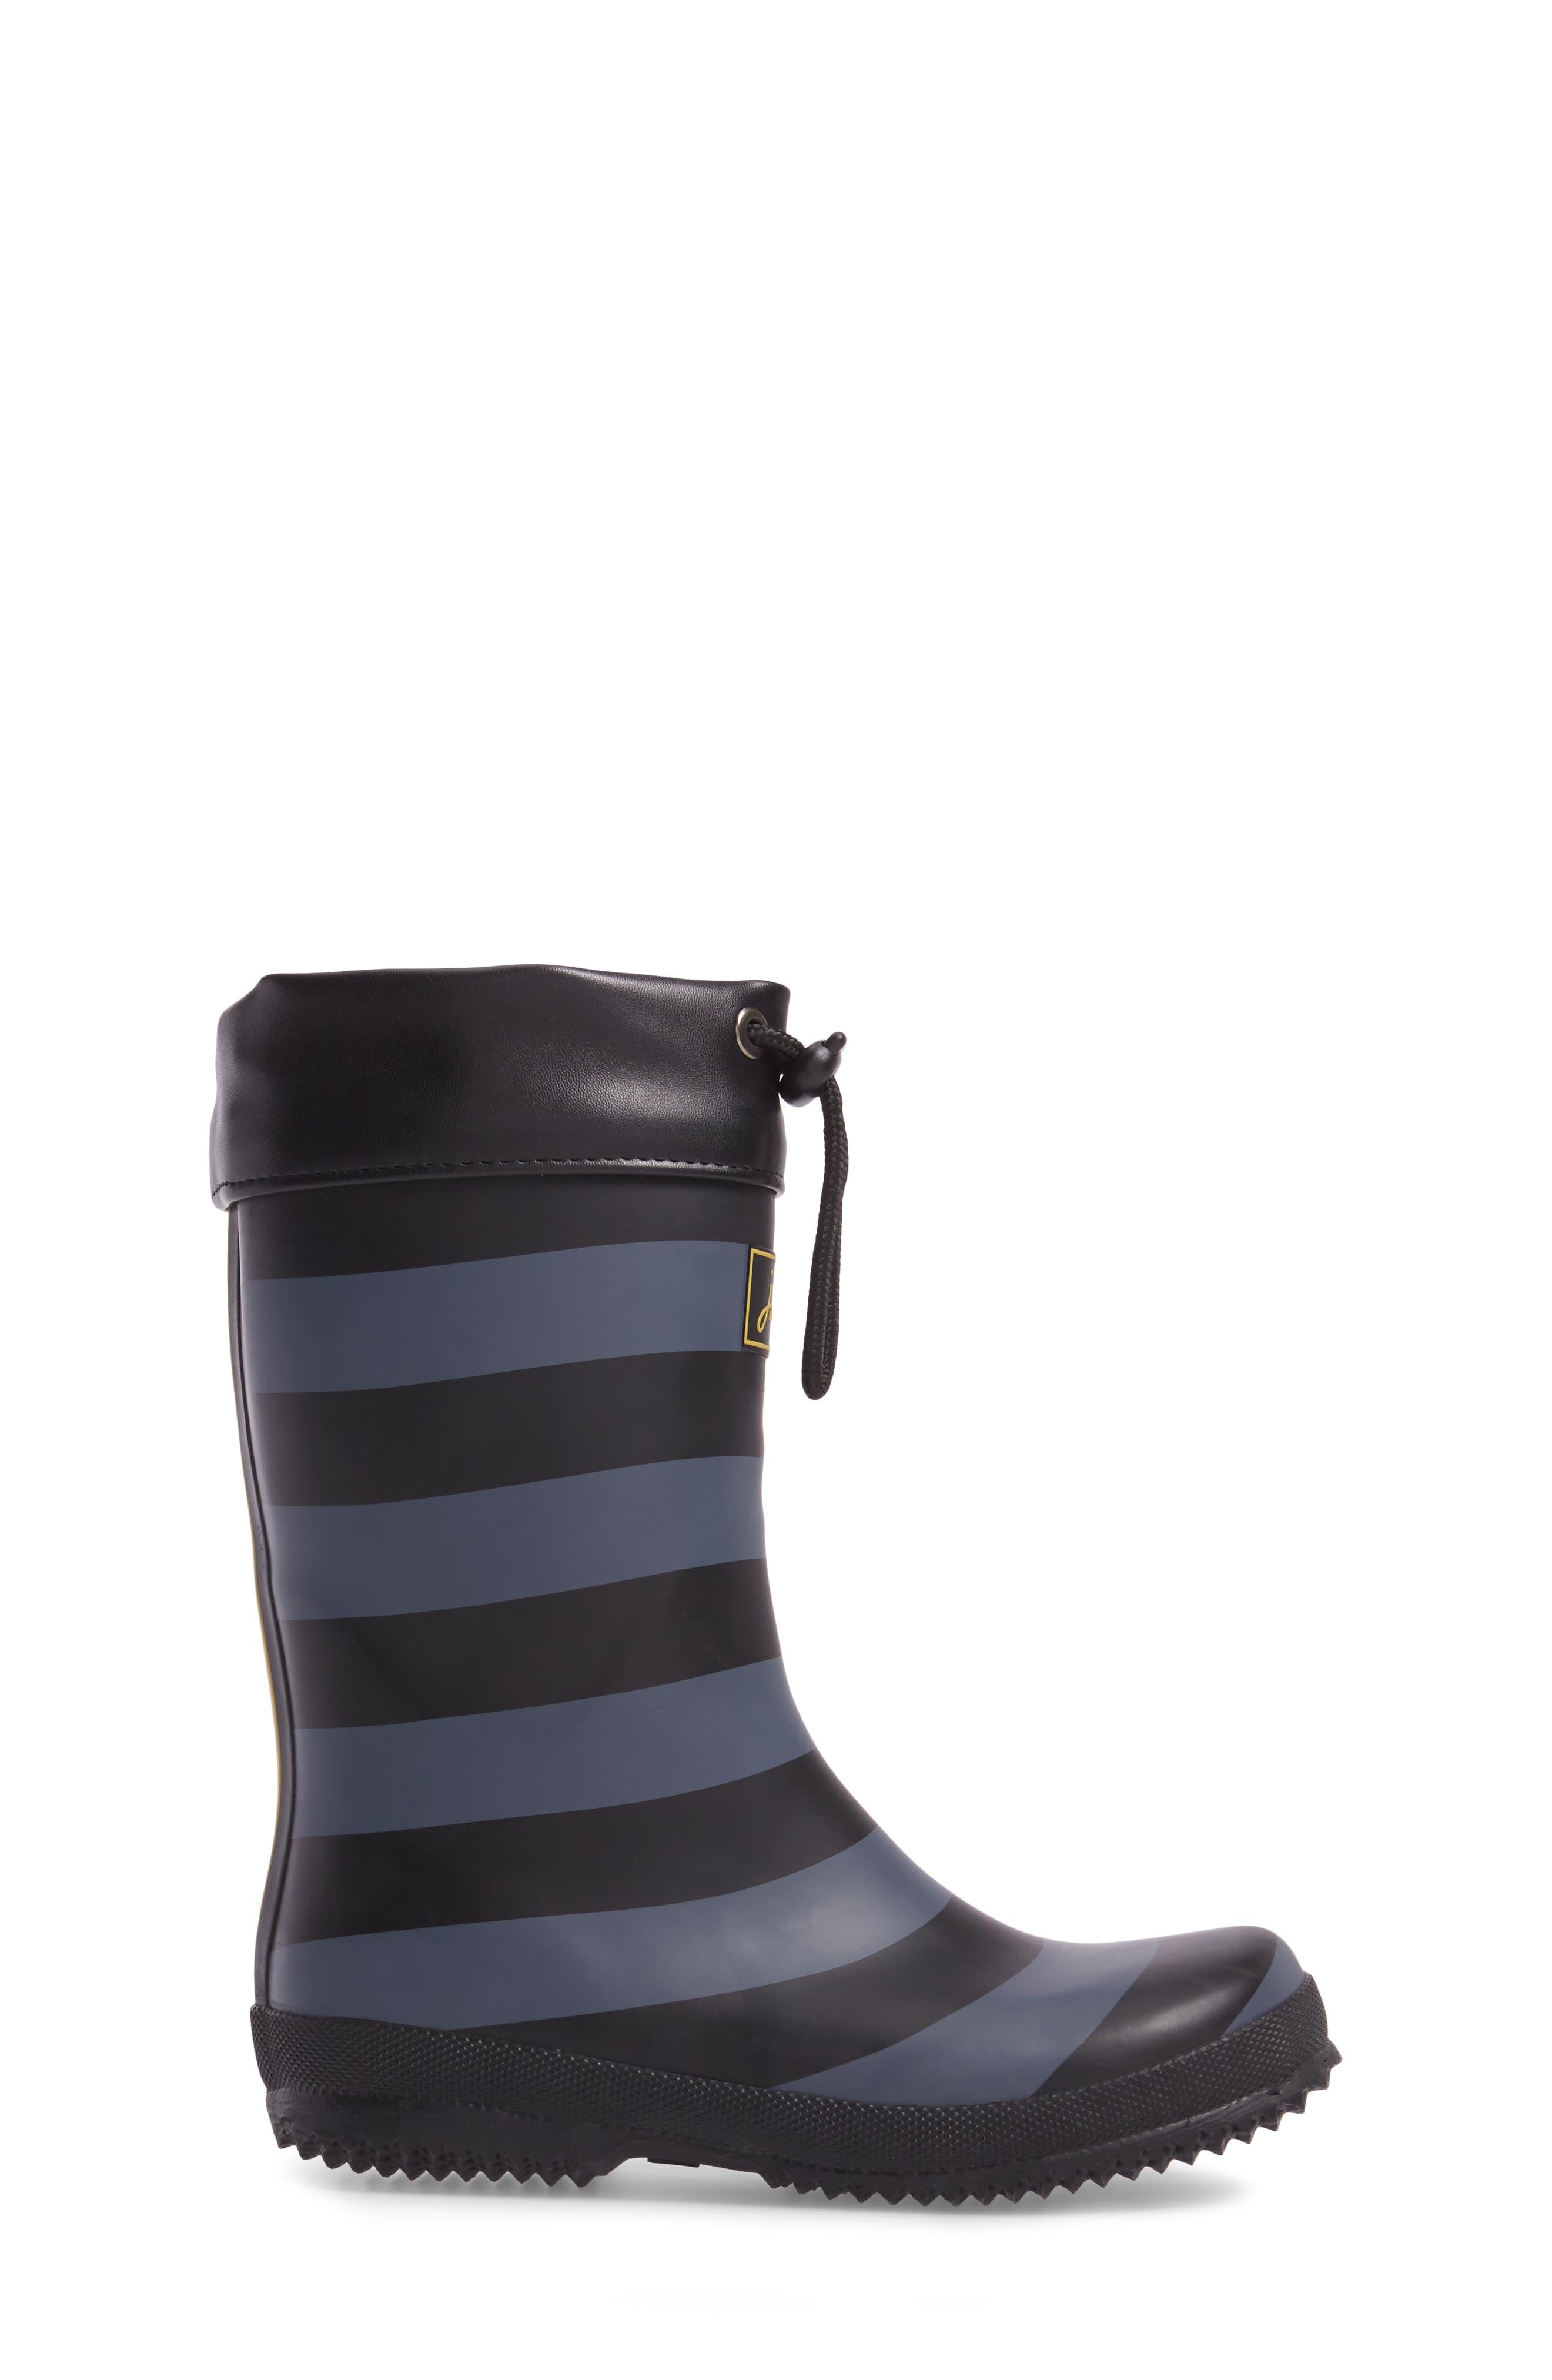 Winter Waterproof Rain Boot,                             Alternate thumbnail 3, color,                             Black Stripe